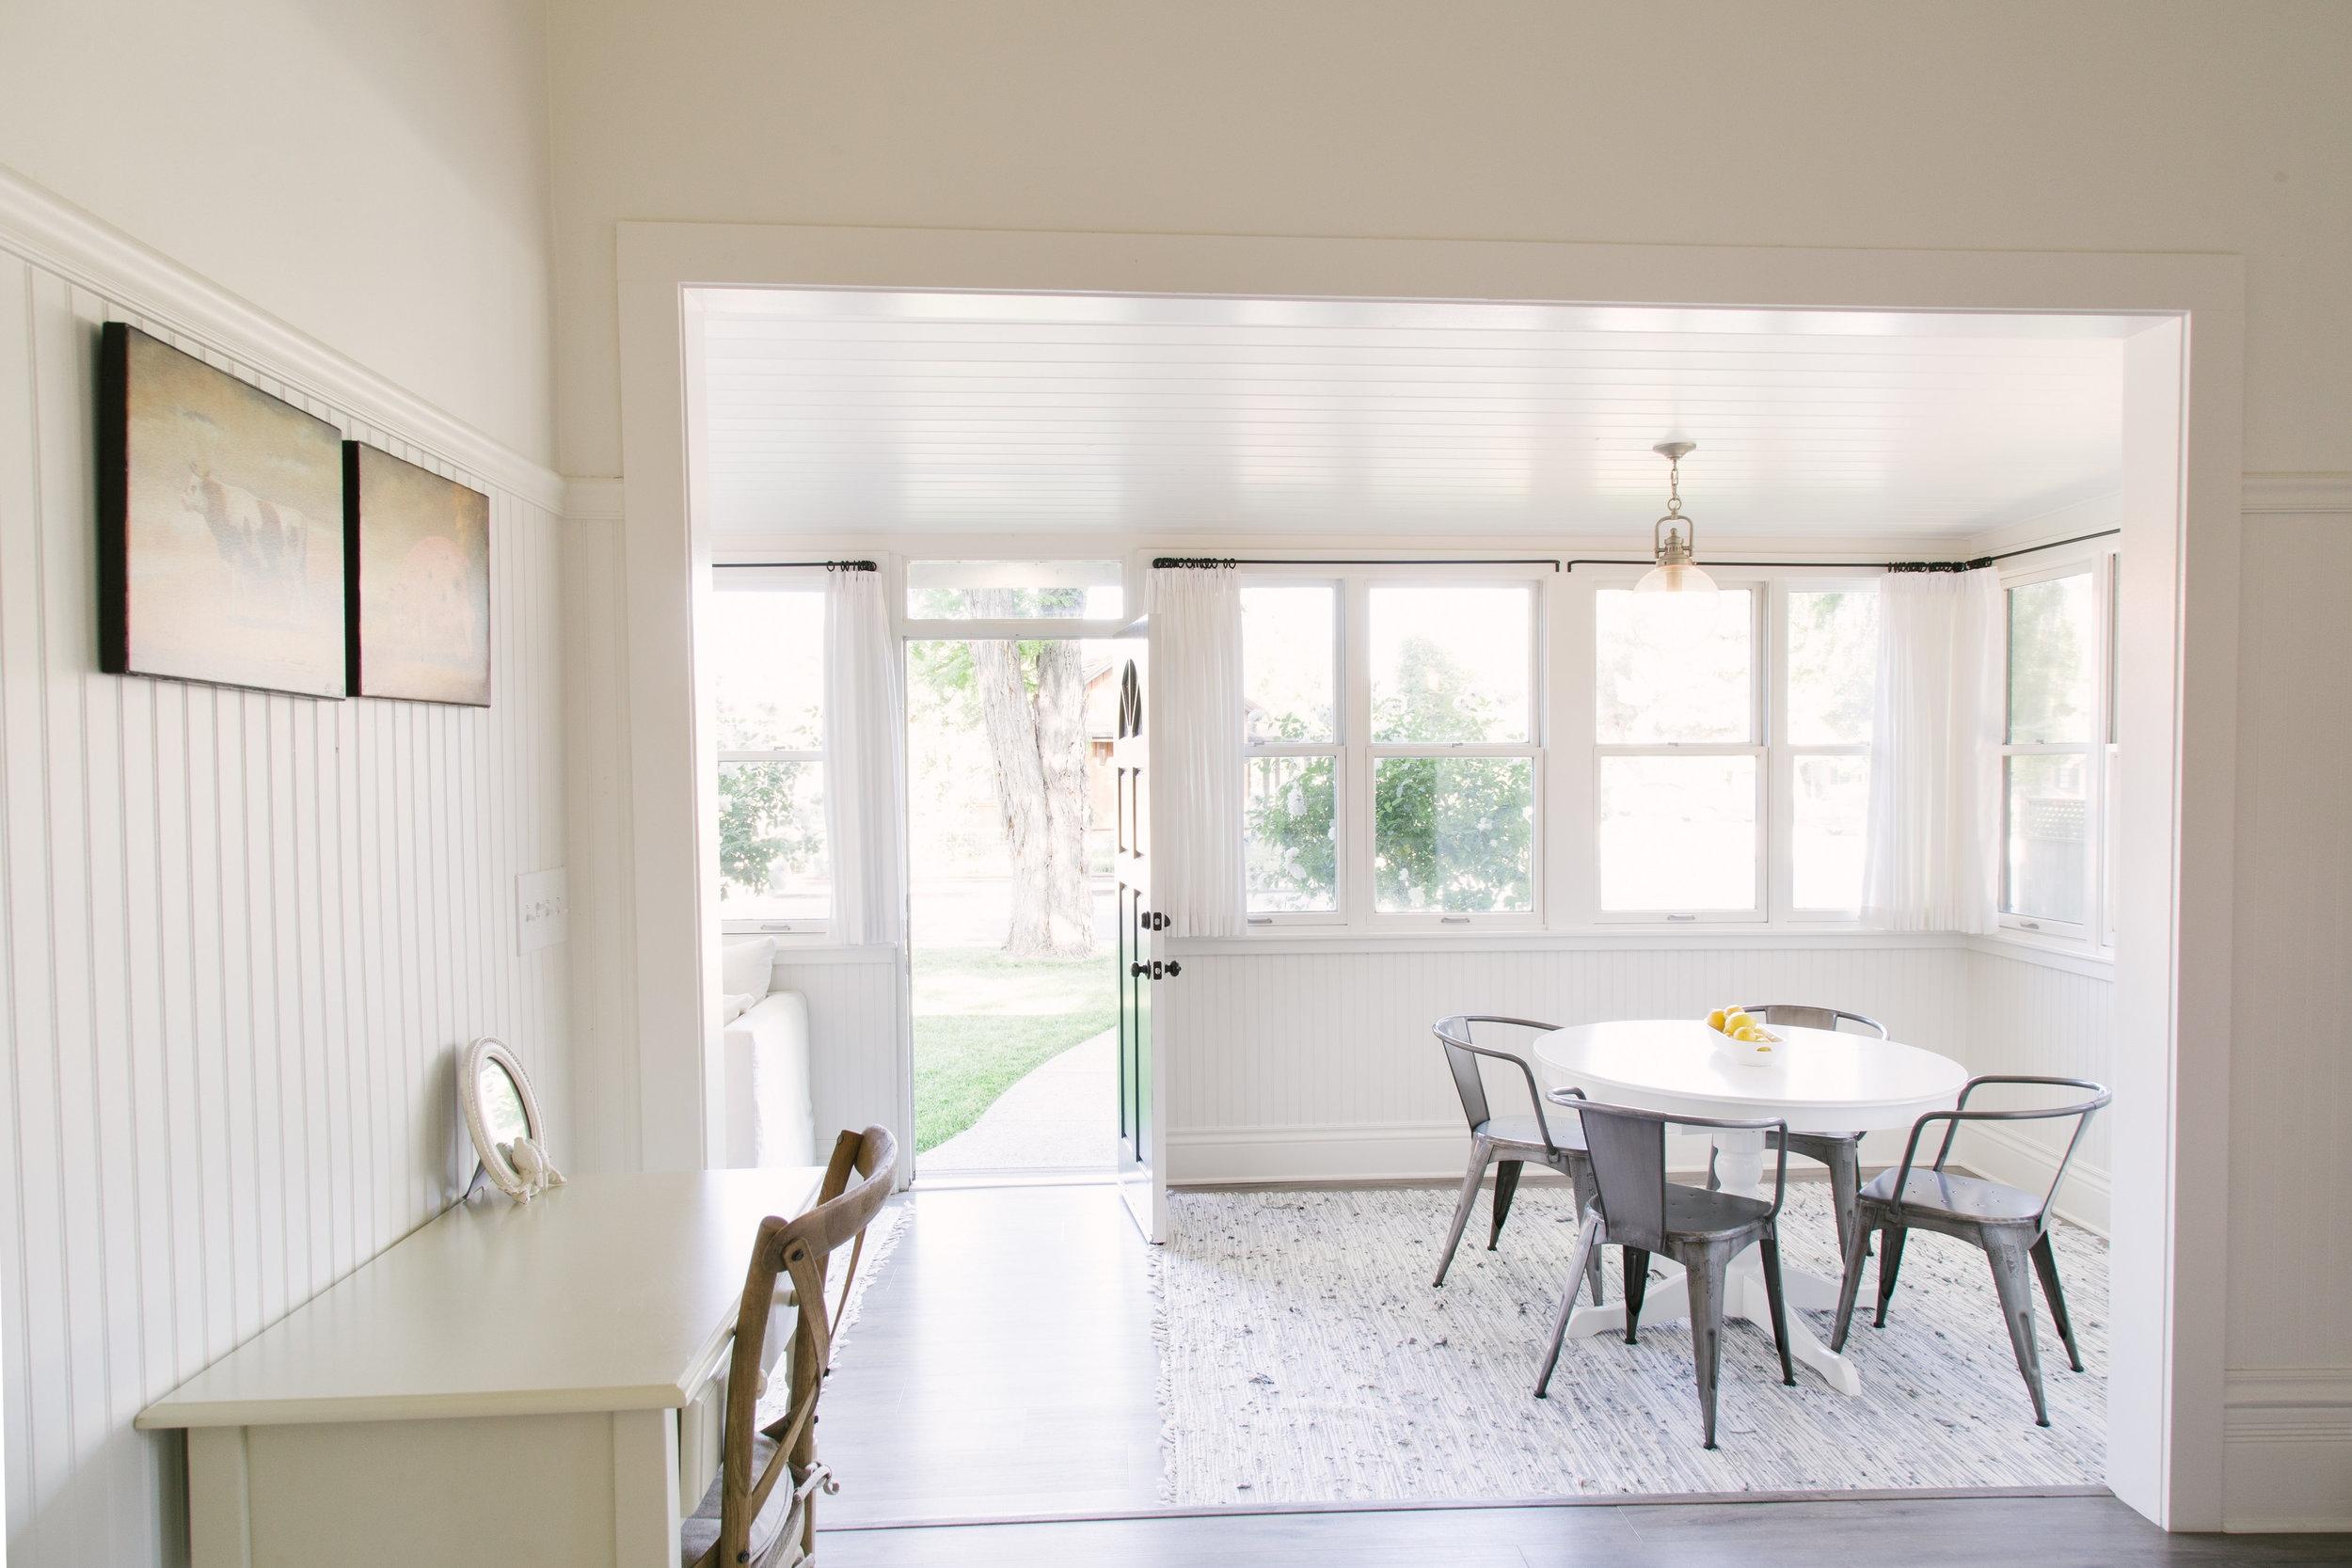 Bungalow 4 - Coyote Brush - 3 bedrooms, 3 bathrooms, accommodates 8